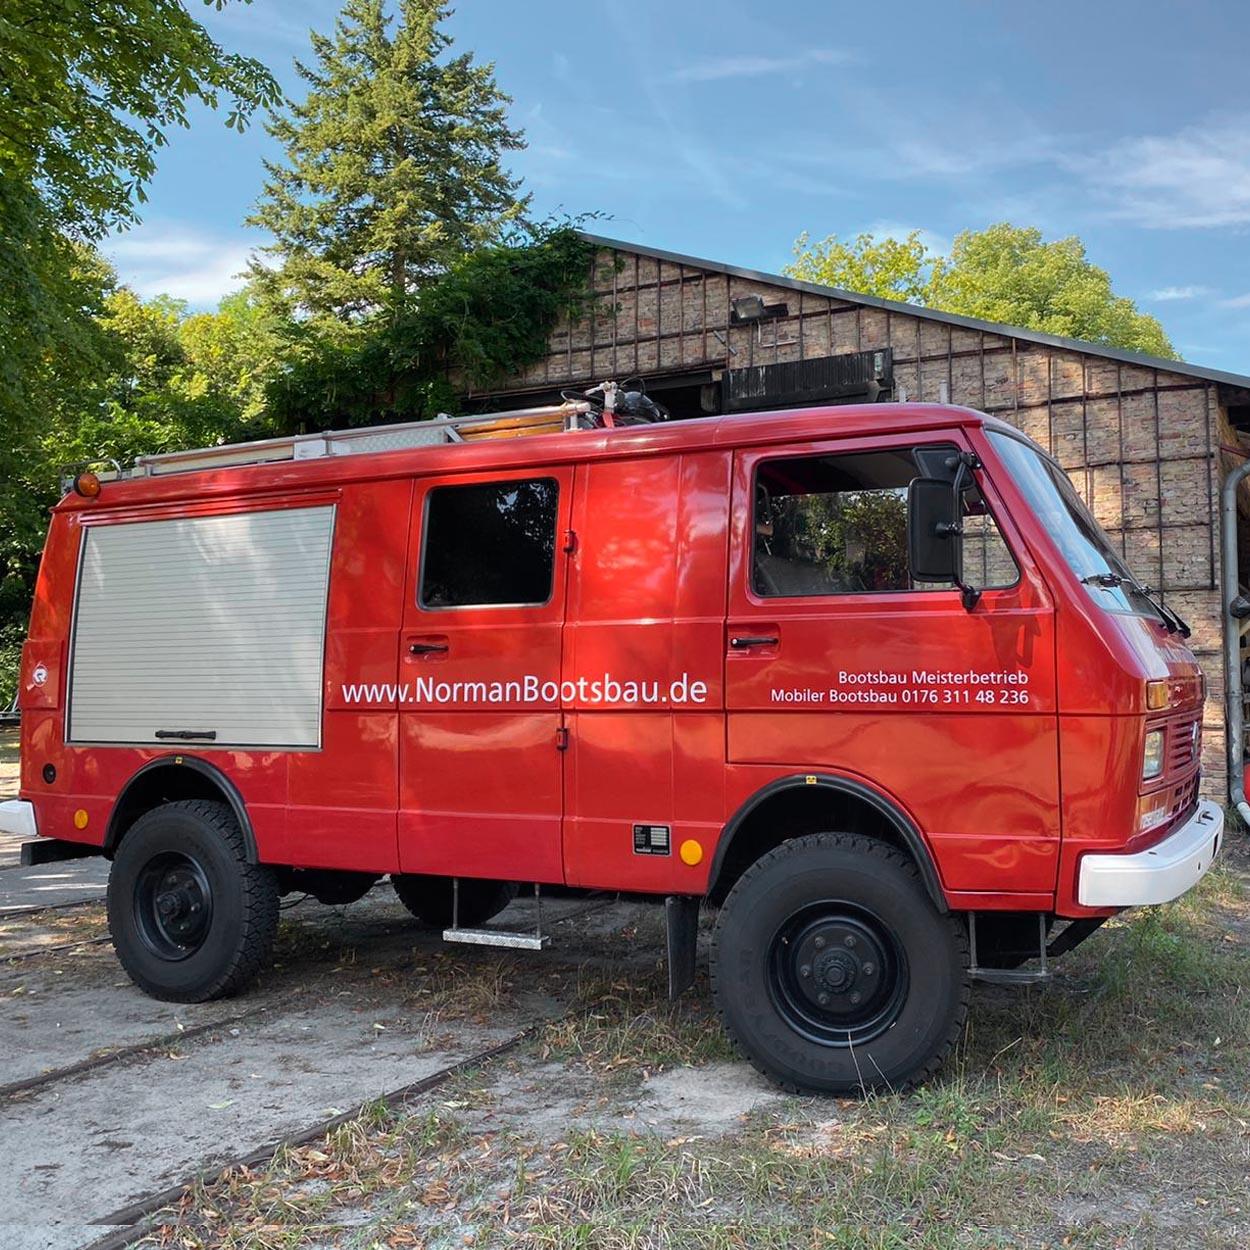 Mobiler-Bootsbau-Feuerwehr-Ronja-Norman-Bootsbau-Potsdam-Mobiler-Bootsbau-Berlin